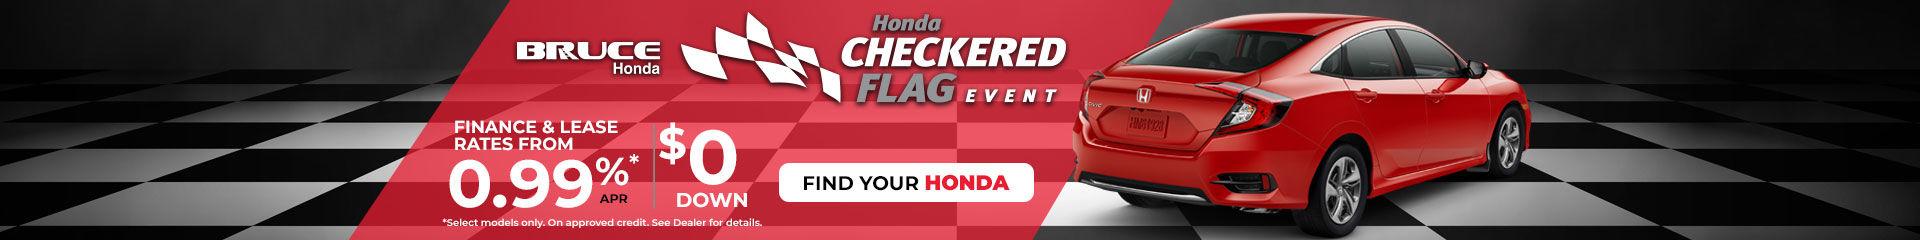 Checkered Flag Event